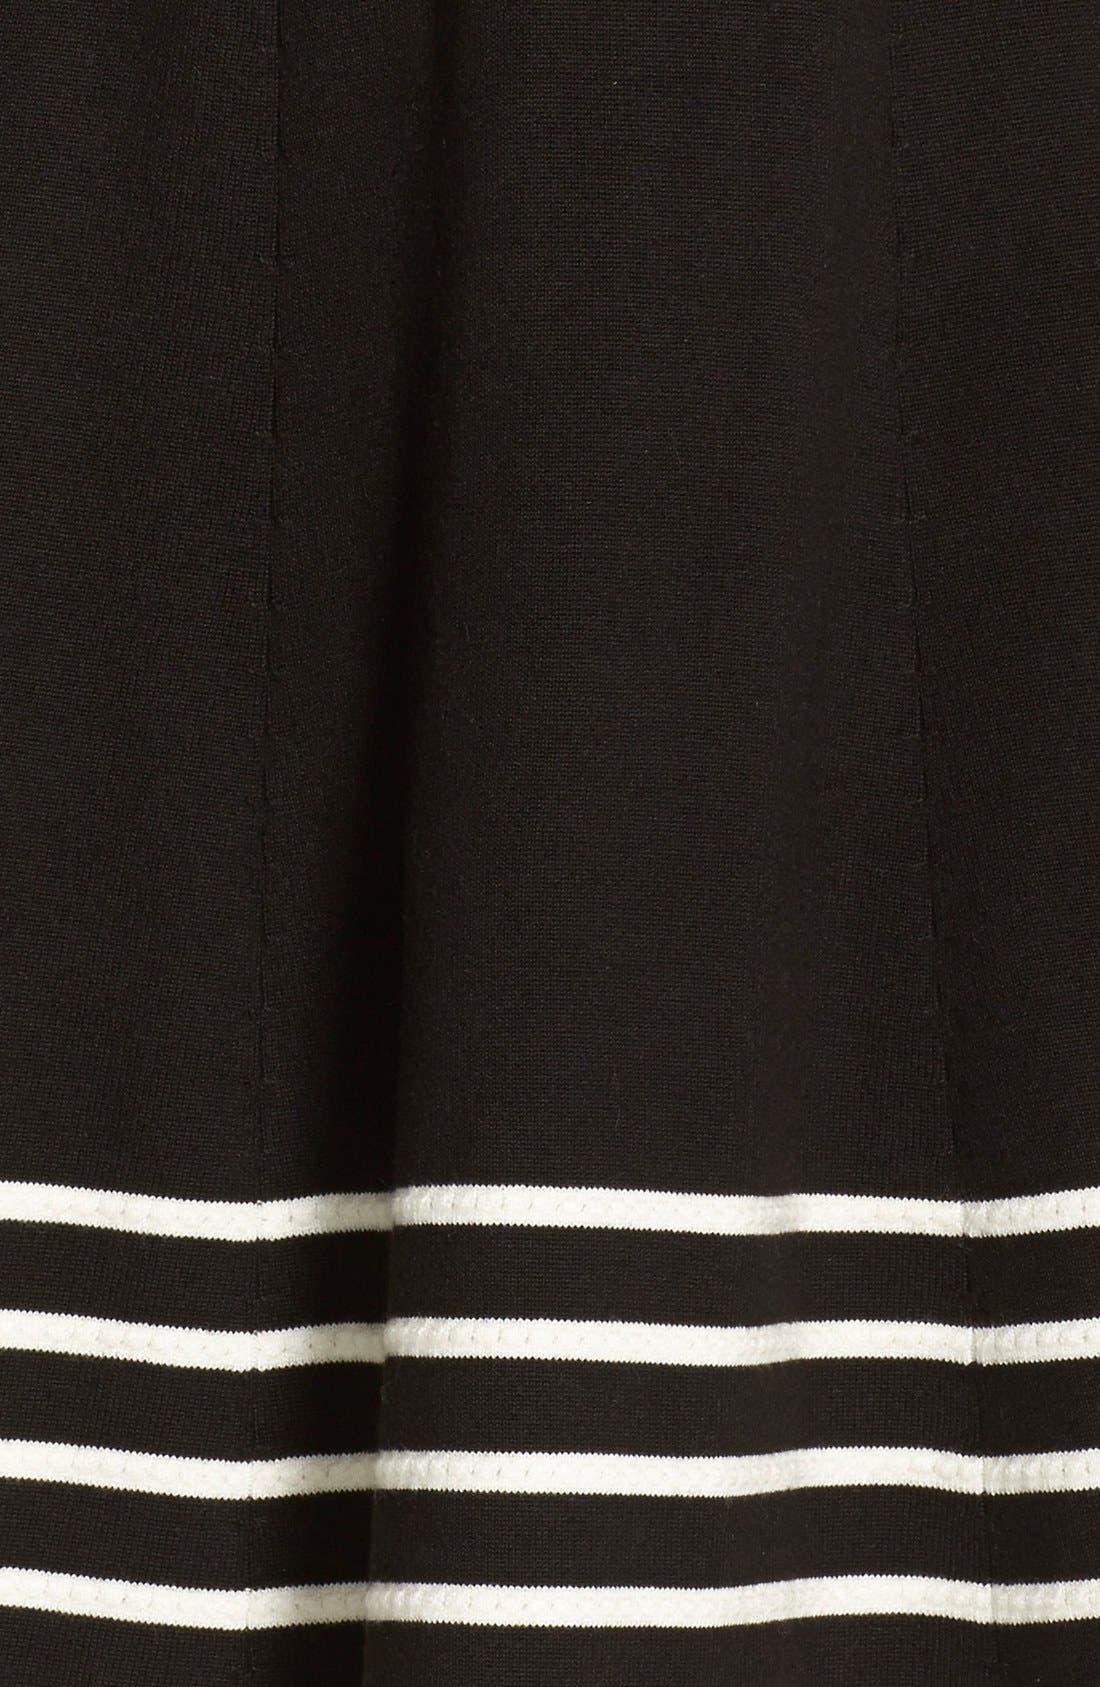 Stripe Knit Flared Dress,                             Alternate thumbnail 8, color,                             001